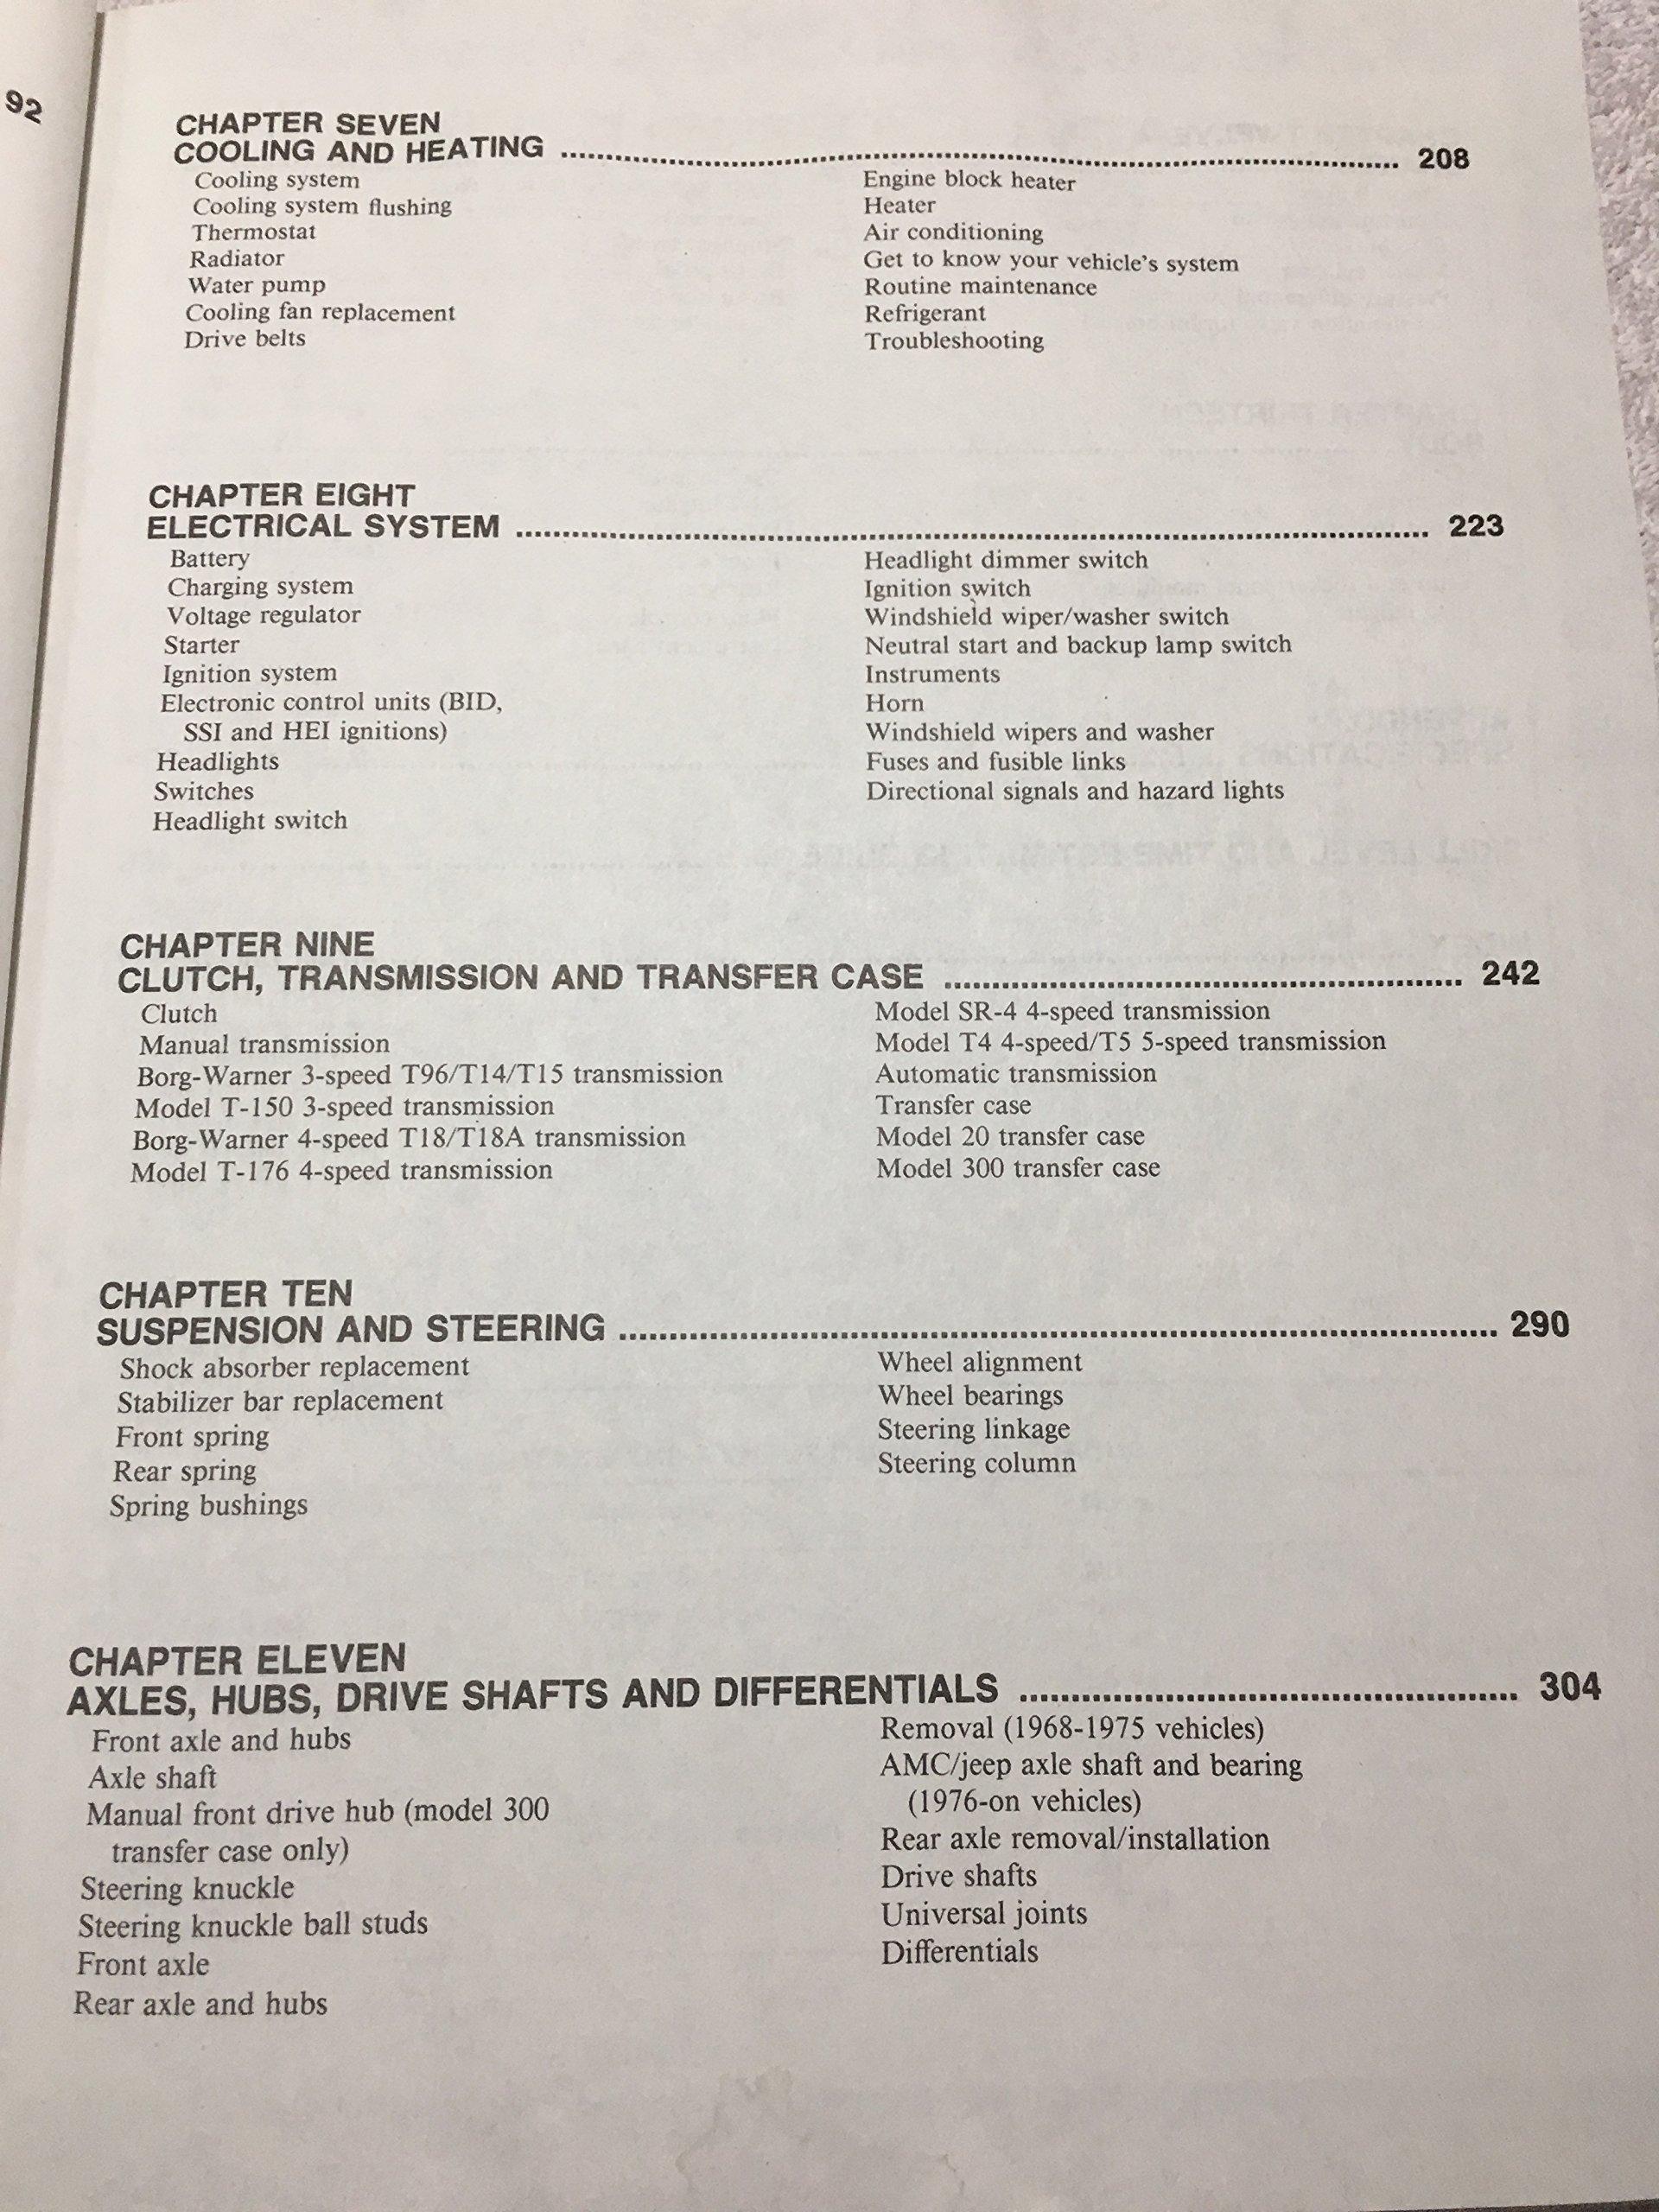 Amc Jeep Super Shop Manual Cj 5 6 7 1968 1986 And Transmissions 9780892874538 Books